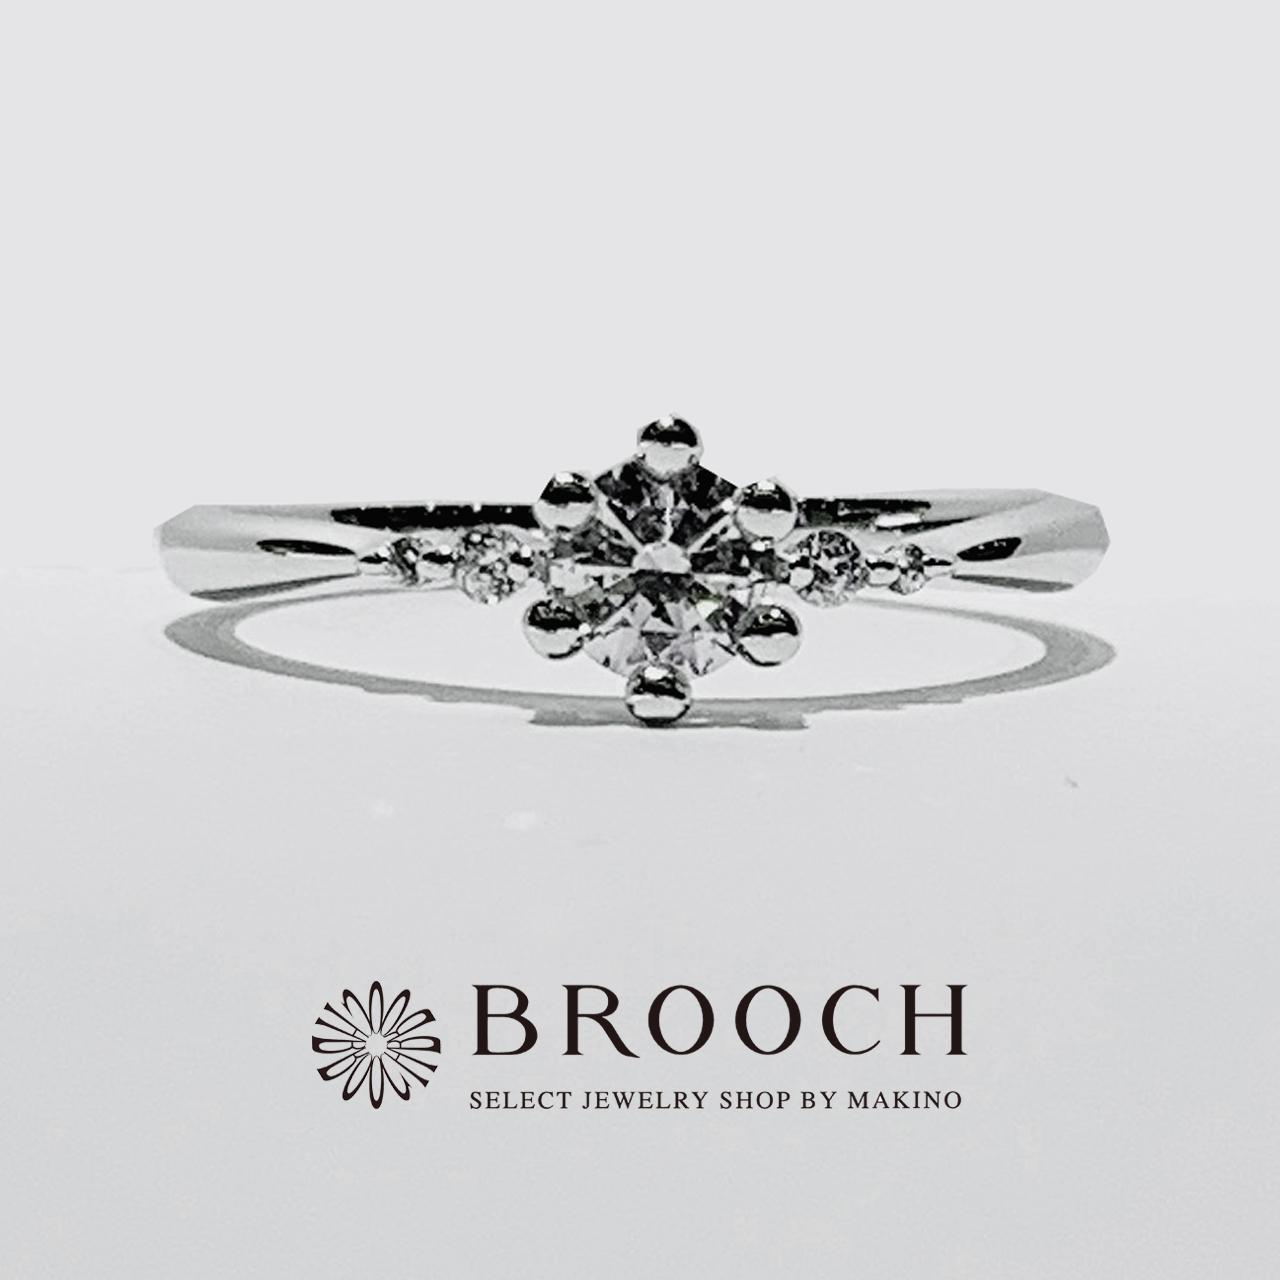 BROOCH 婚約指輪 エンゲージリング 王冠風デザイン